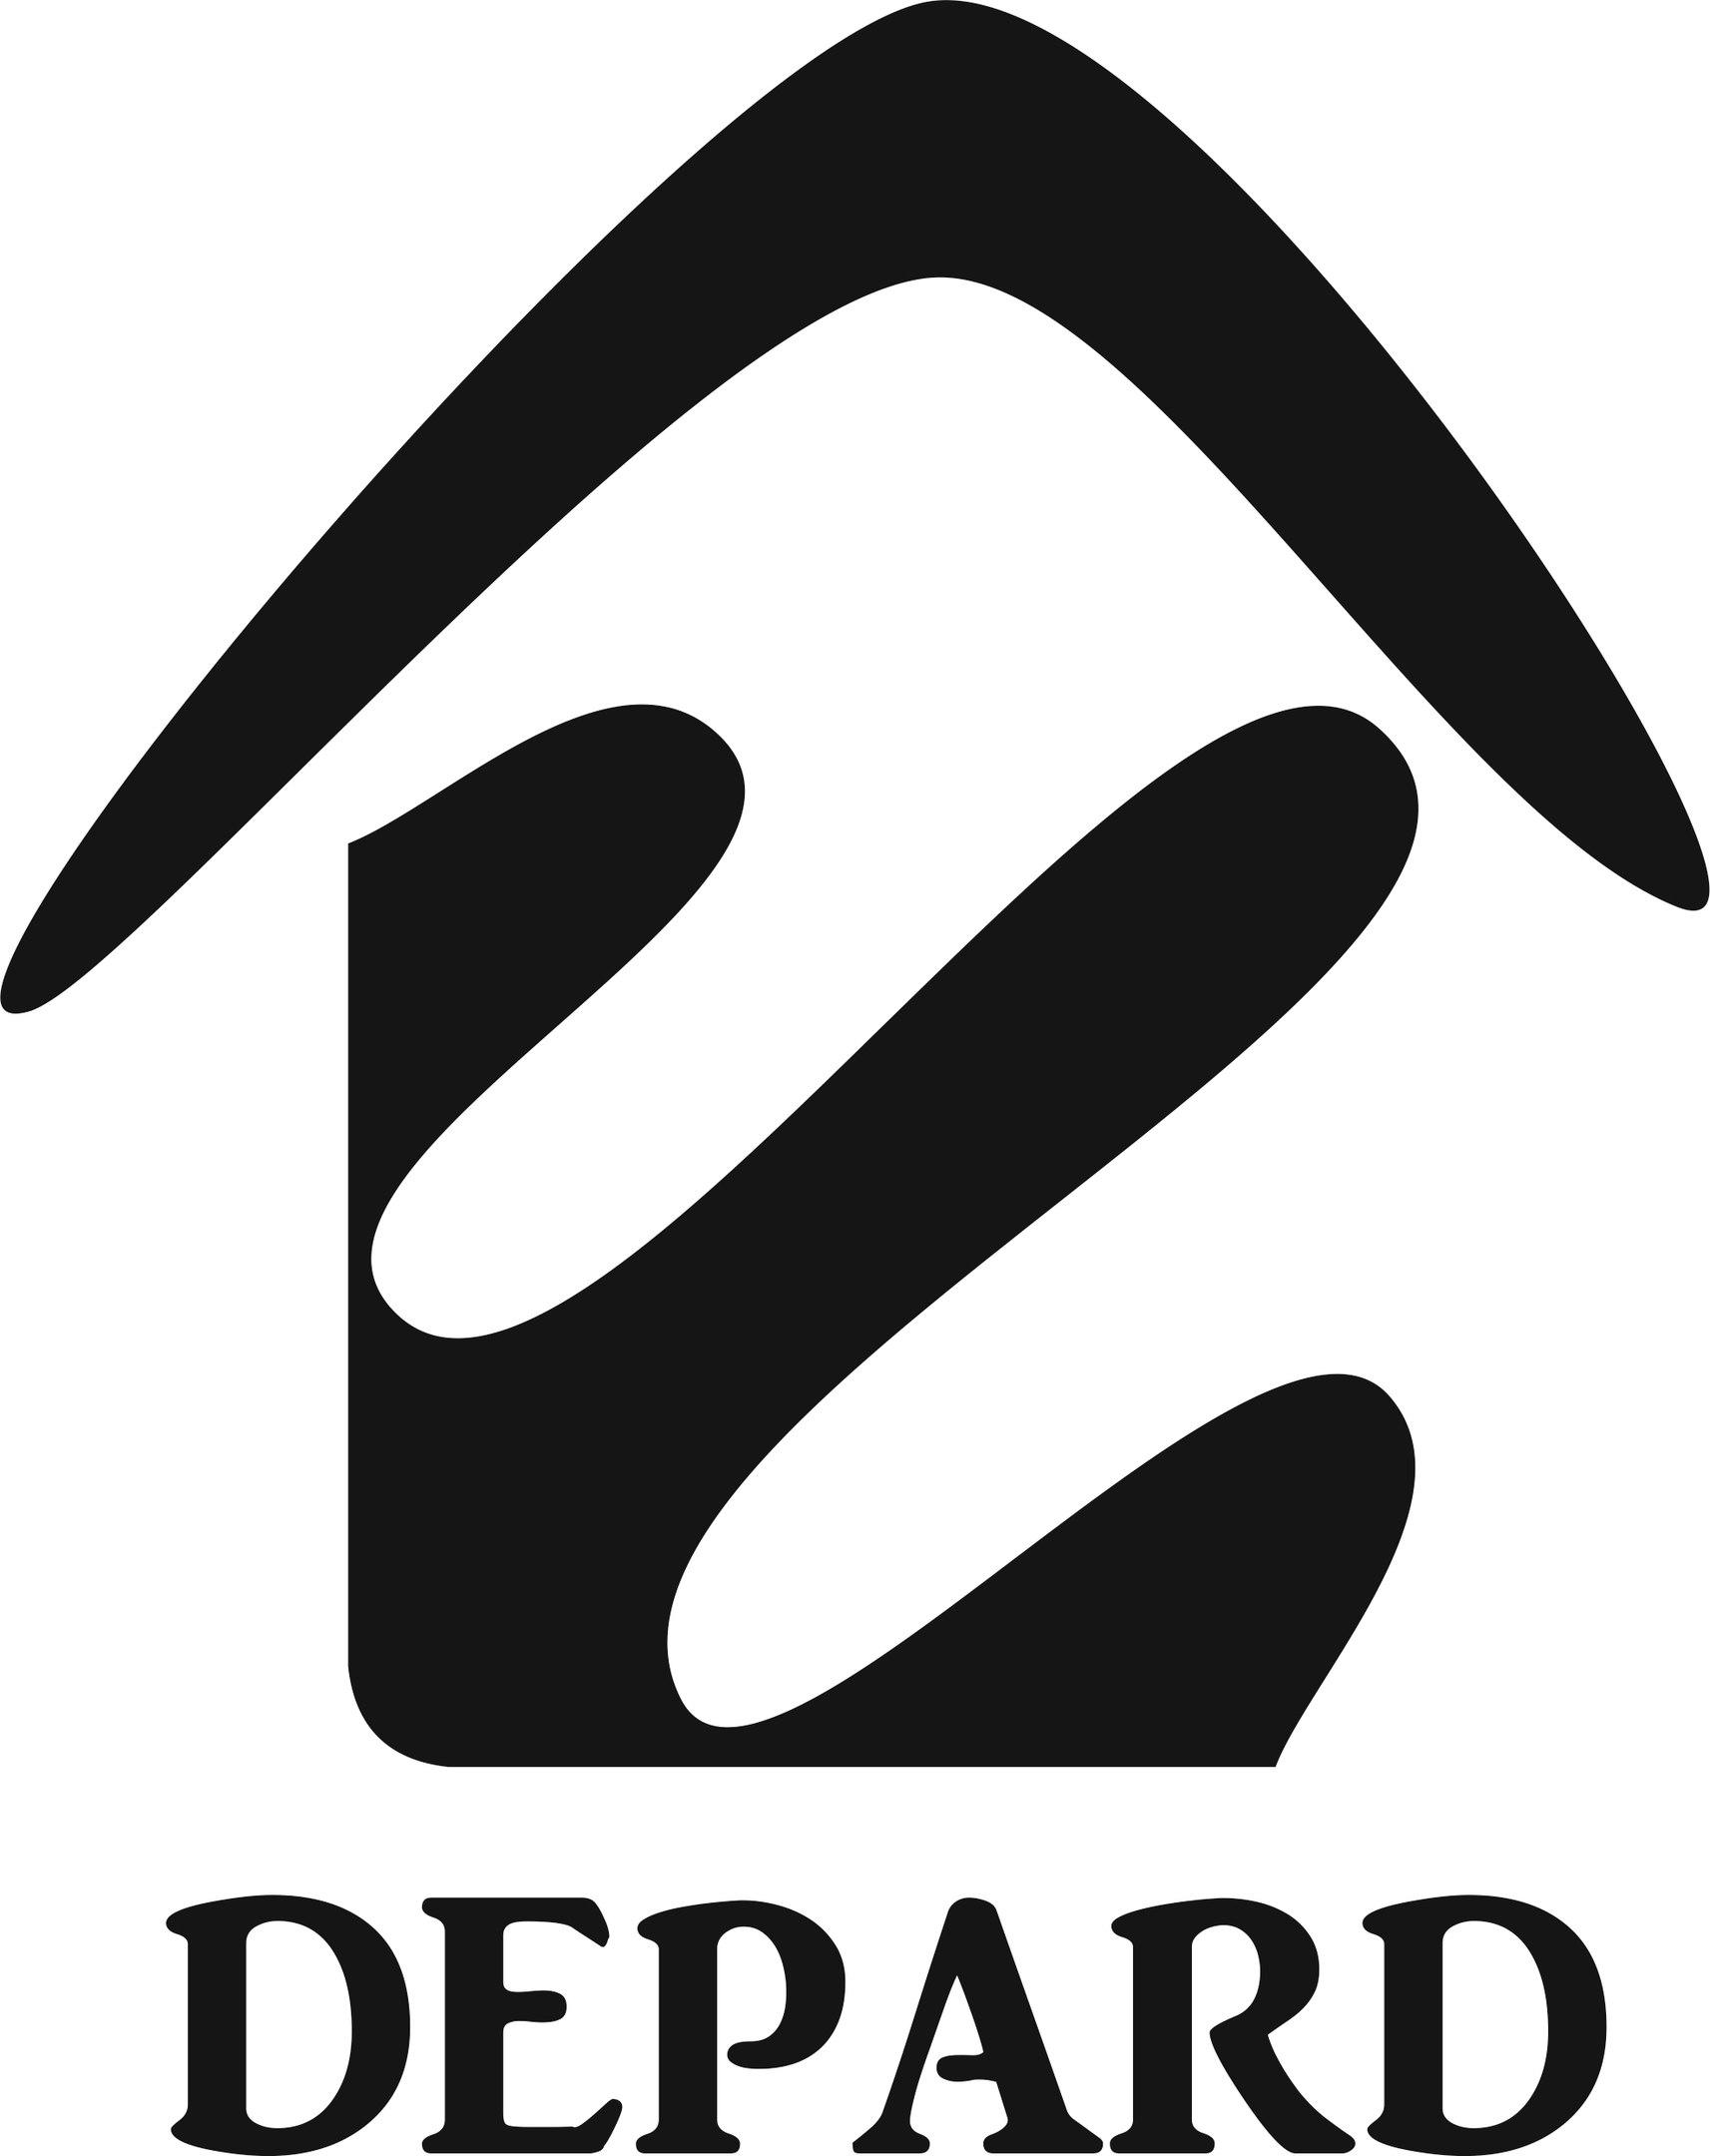 Логотип для компании (услуги недвижимость) фото f_574592fefd4e5923.jpg